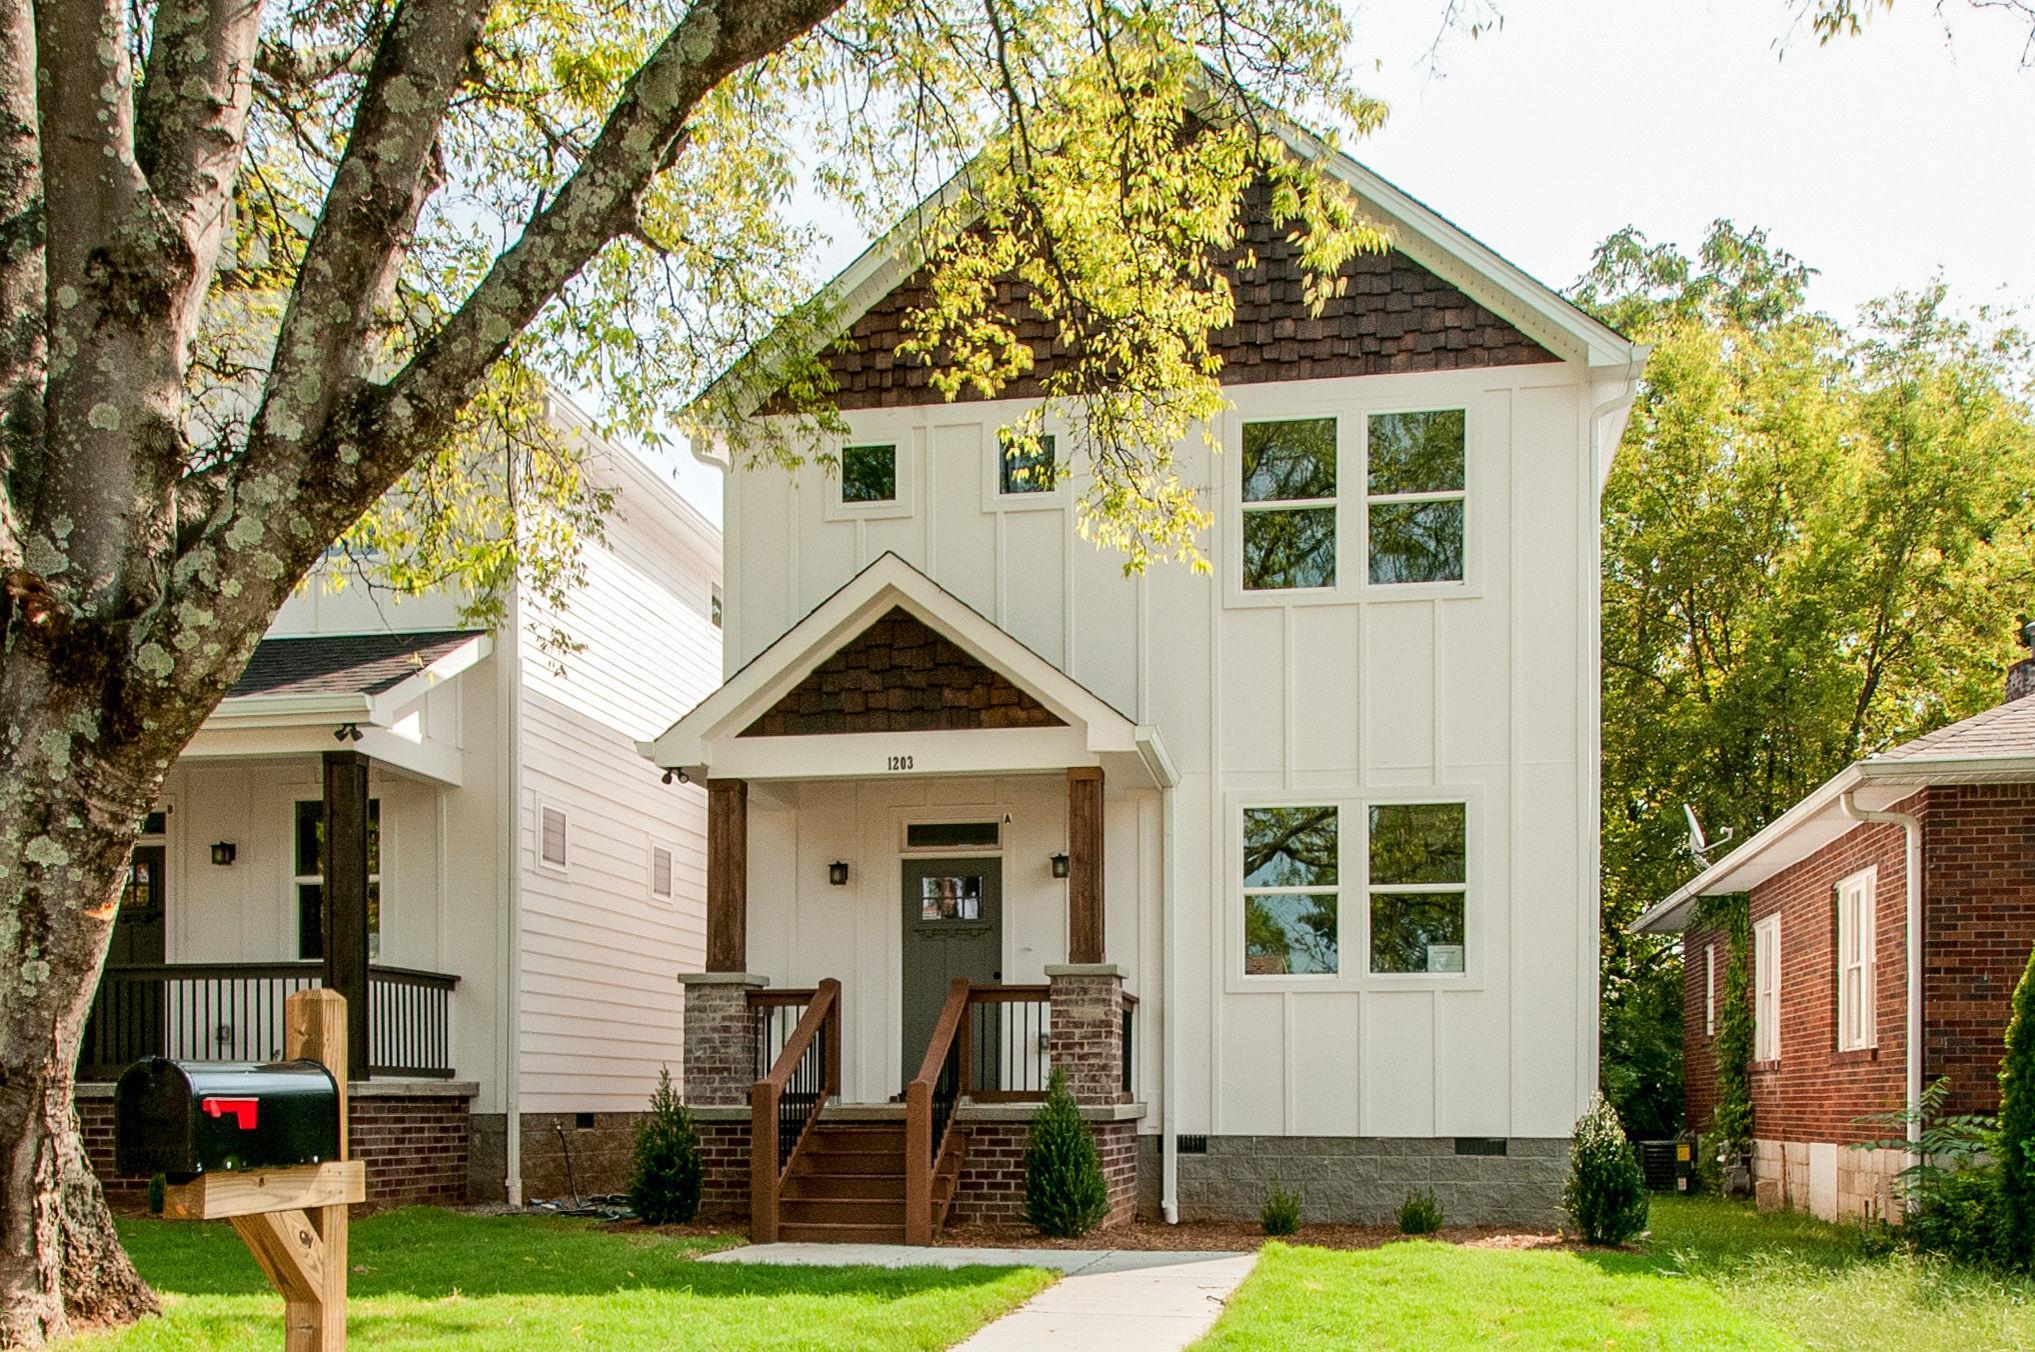 1203 A N 5th St, Nashville, TN 37207 - Nashville, TN real estate listing